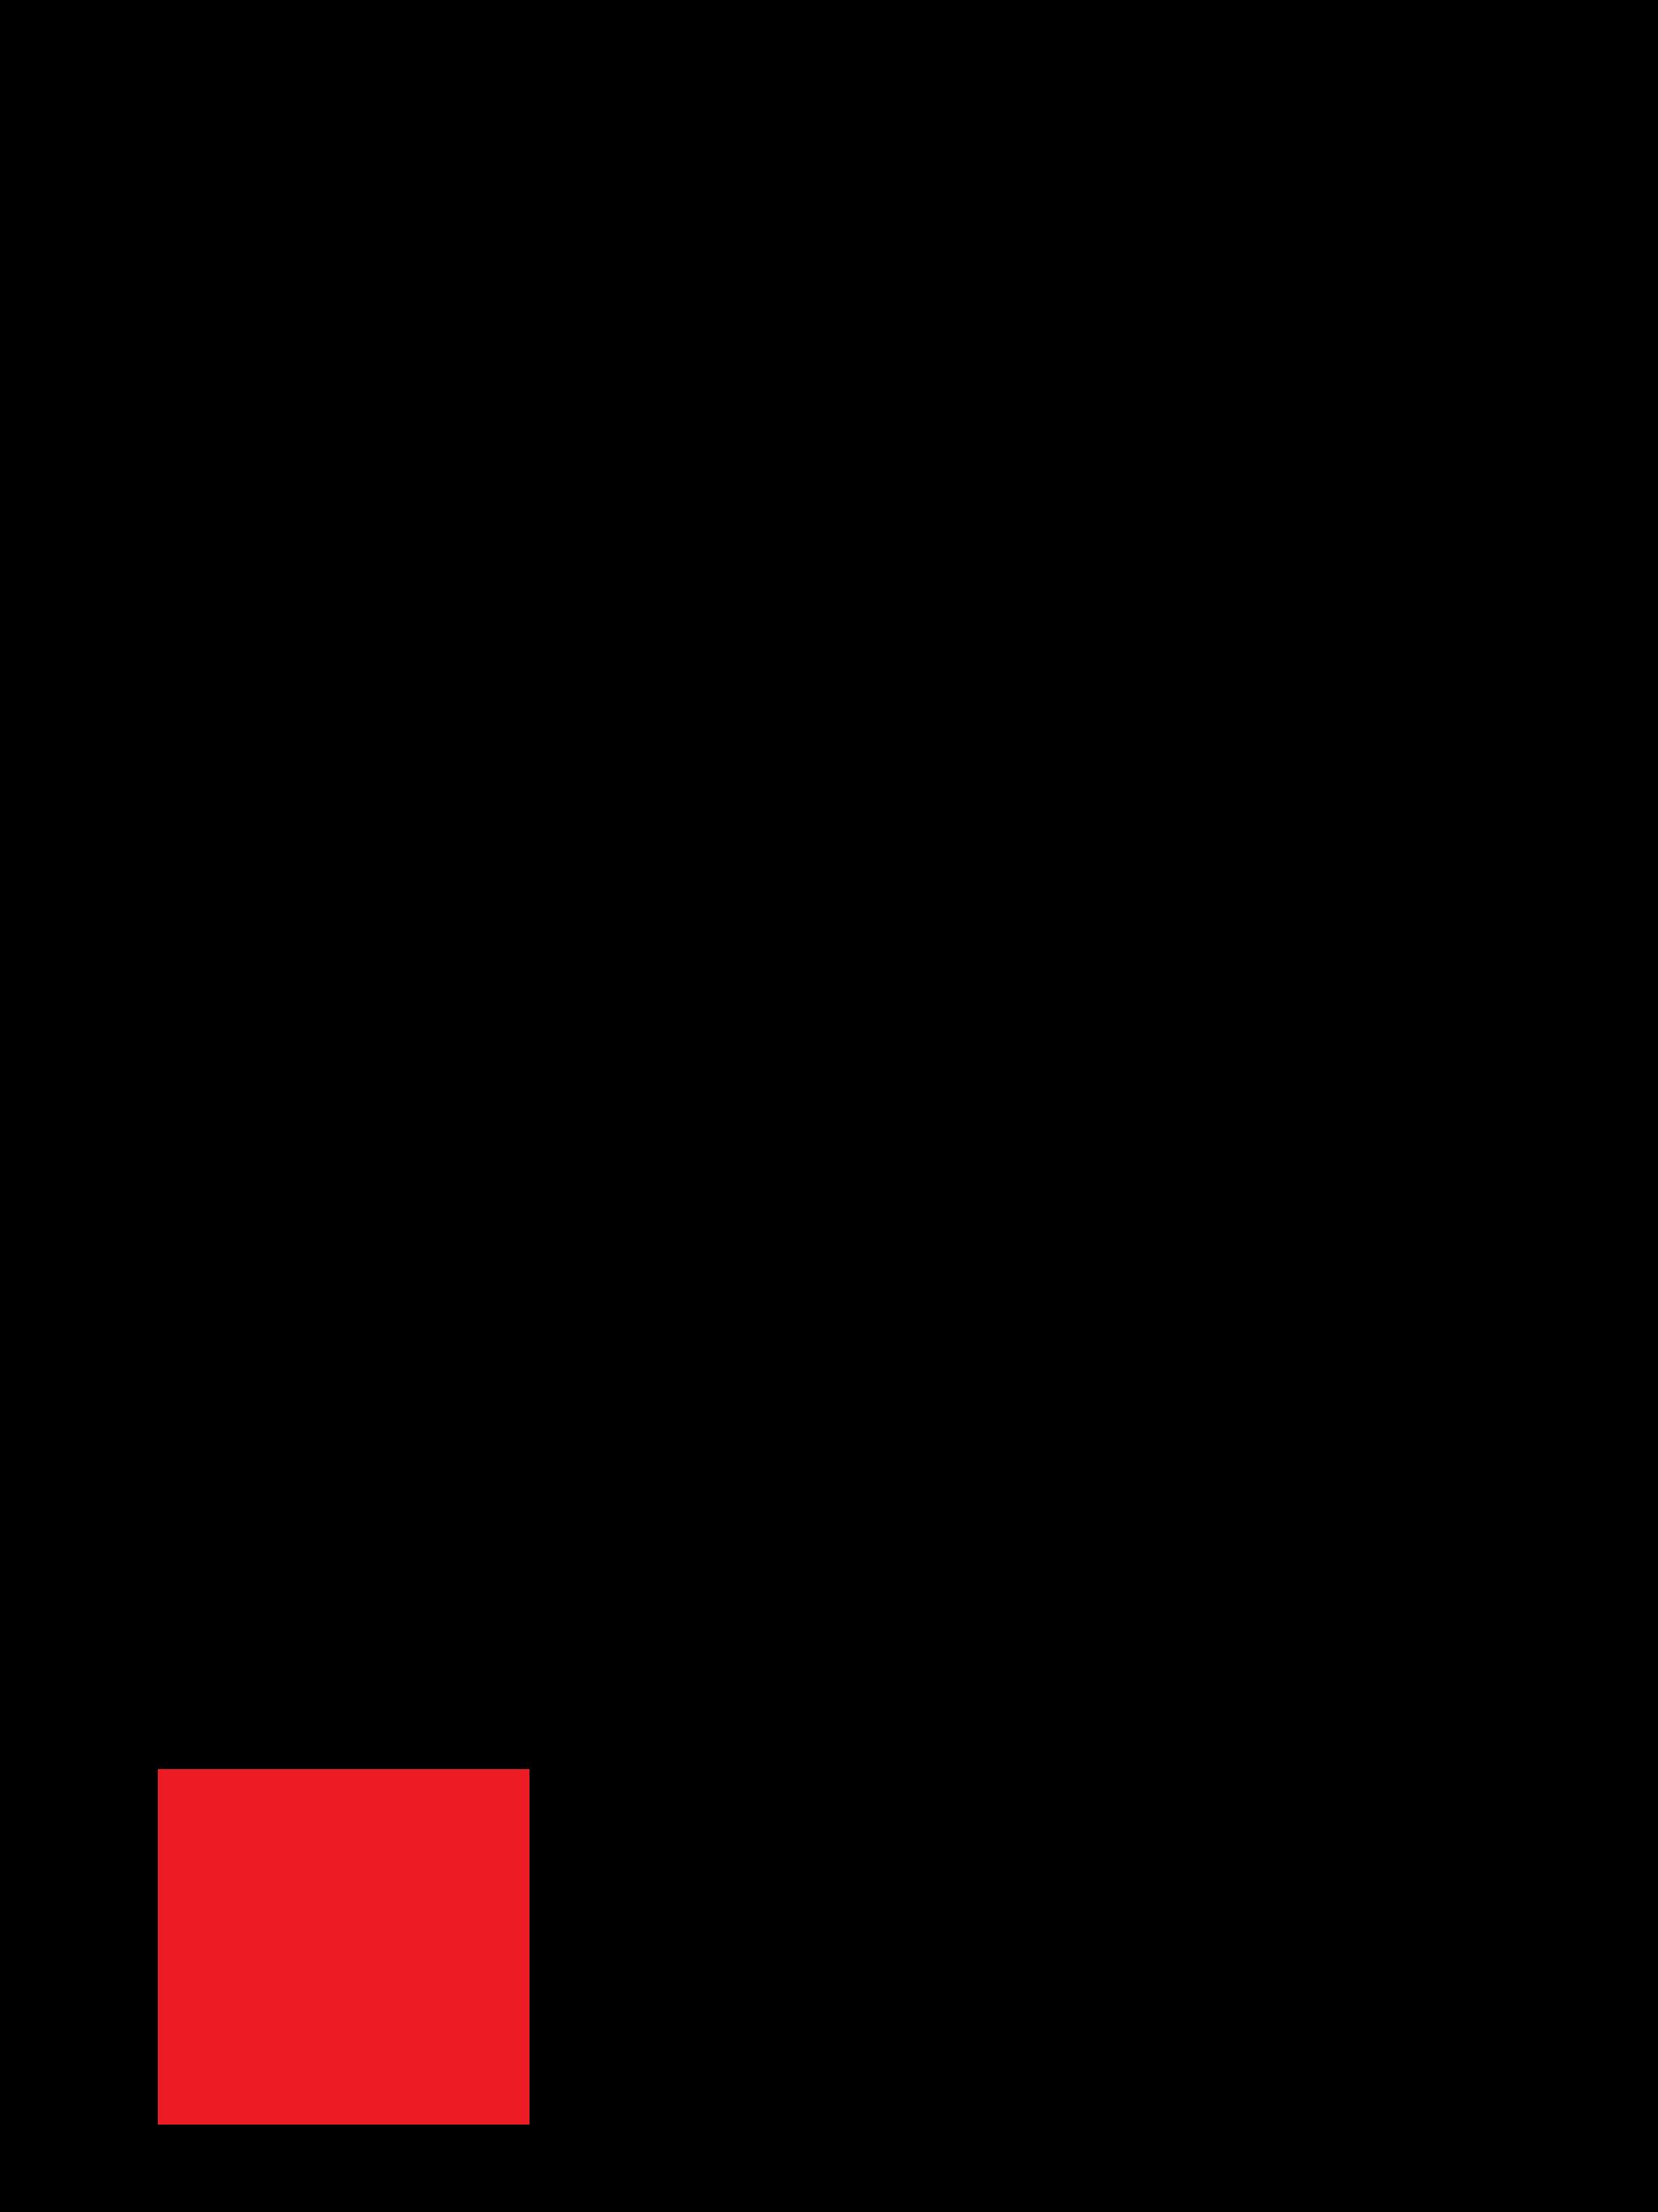 Ipad Vertical_2048x2732_Geo Heart_Red.png